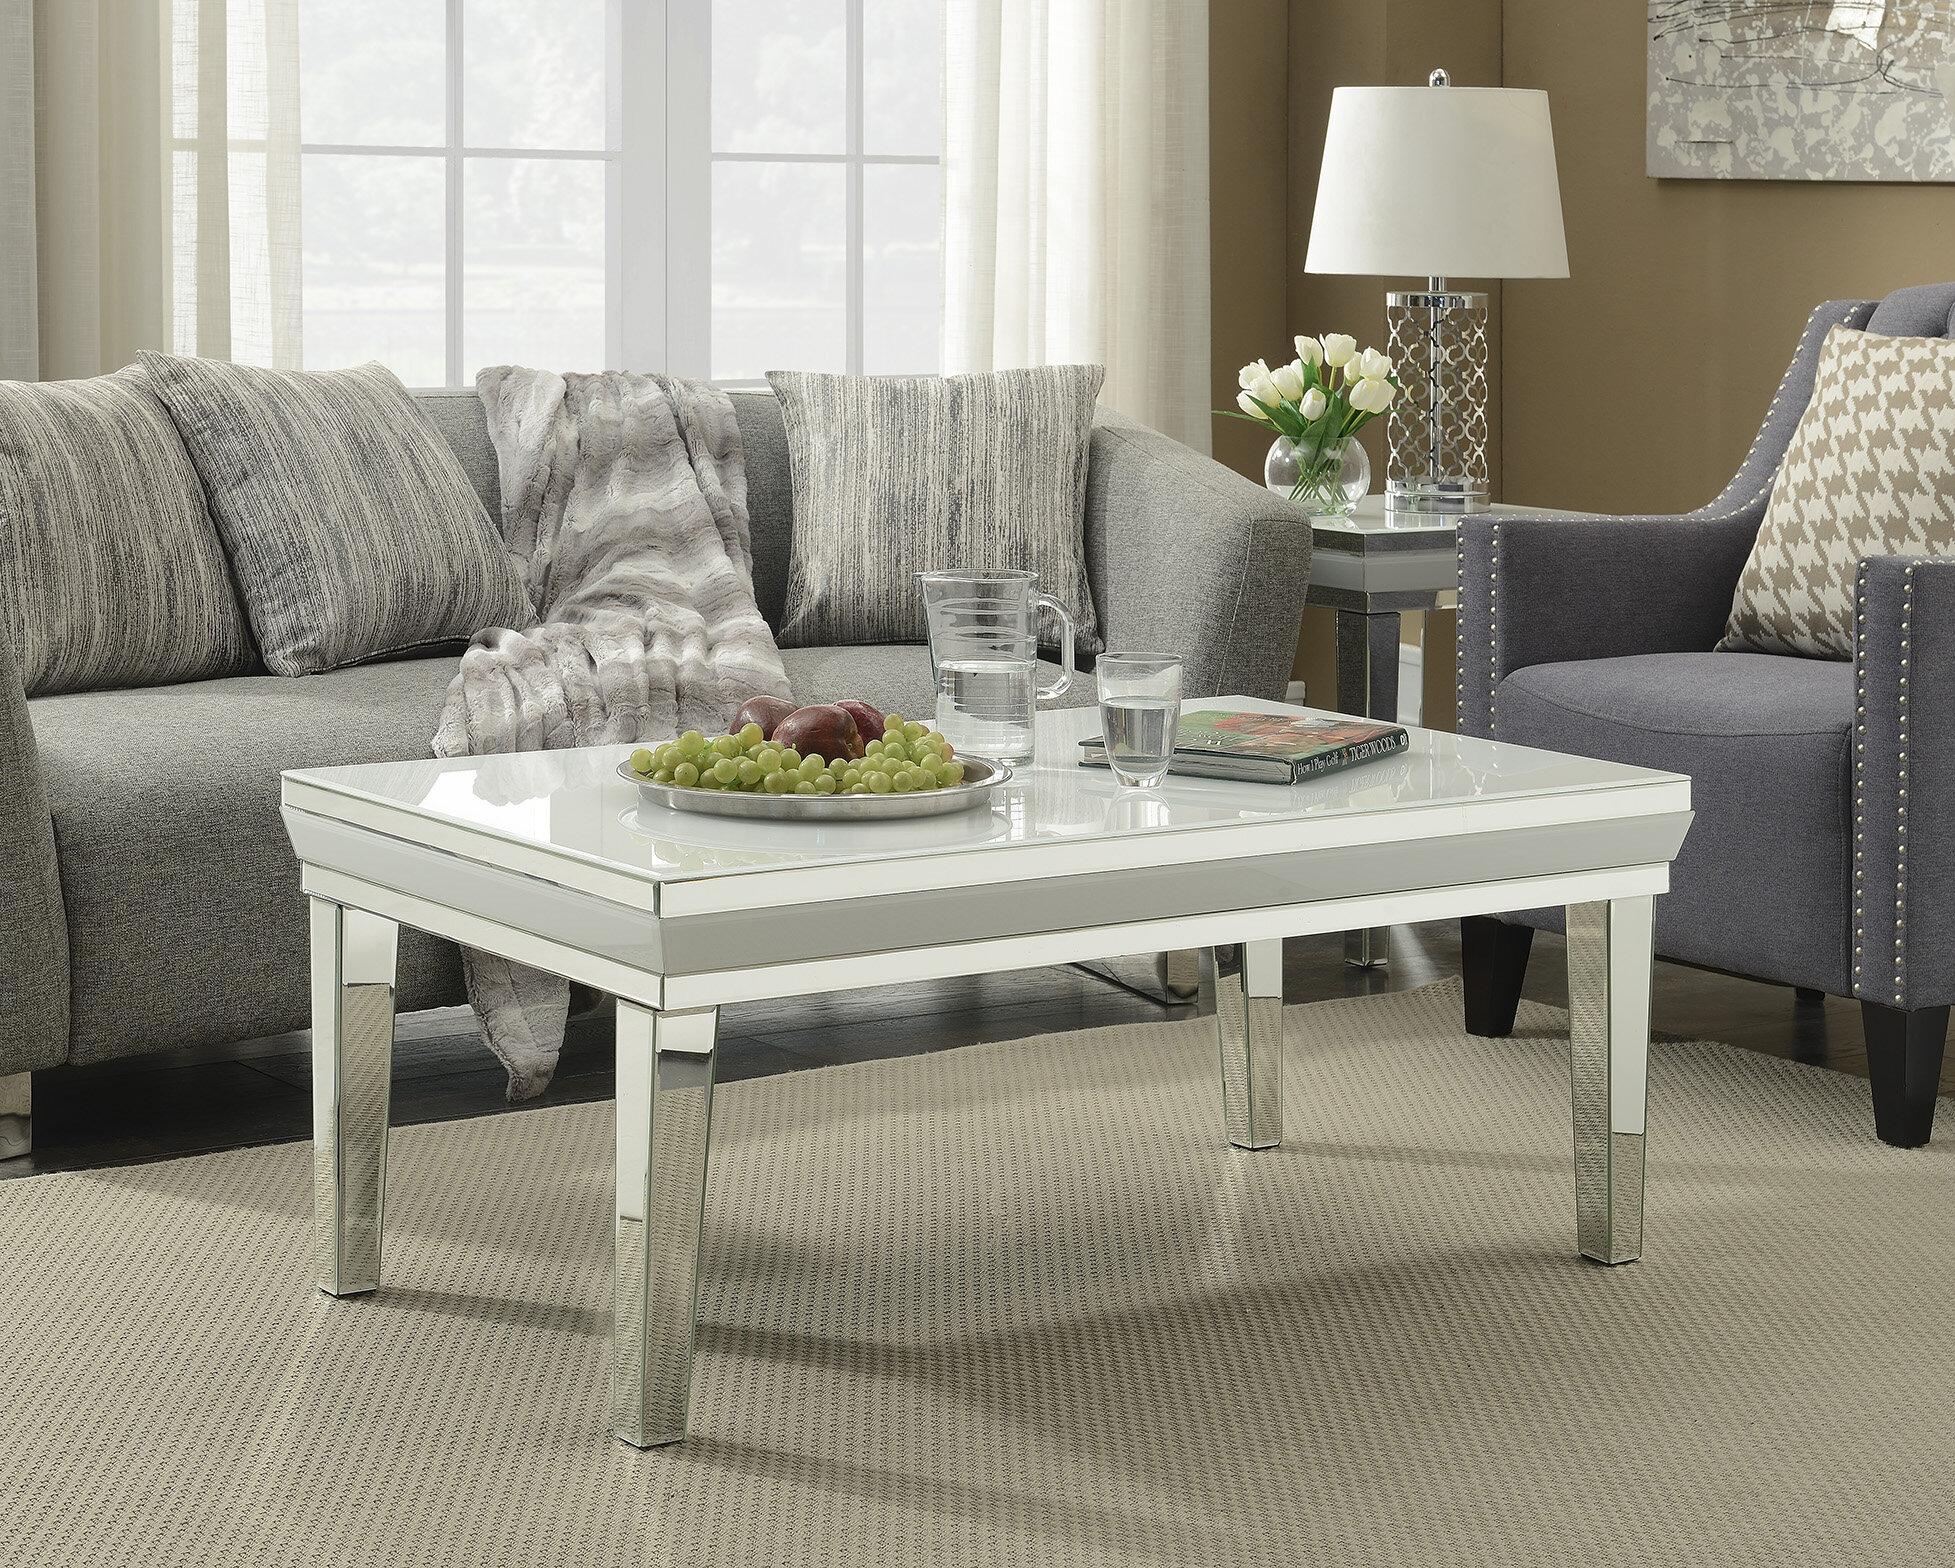 Enjoyable Weston 2 Piece Coffee Table Set Home Interior And Landscaping Ologienasavecom